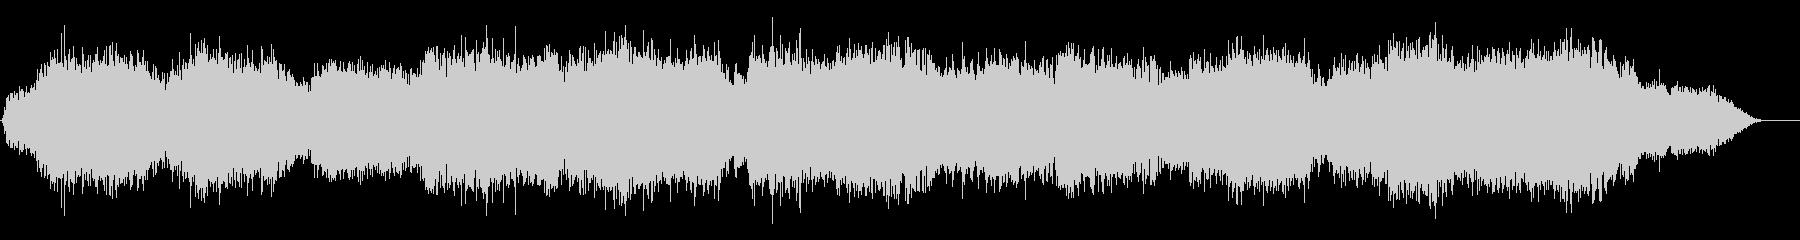 Suspicious Oba ❤ Mysterious chorus ❤ B's unreproduced waveform